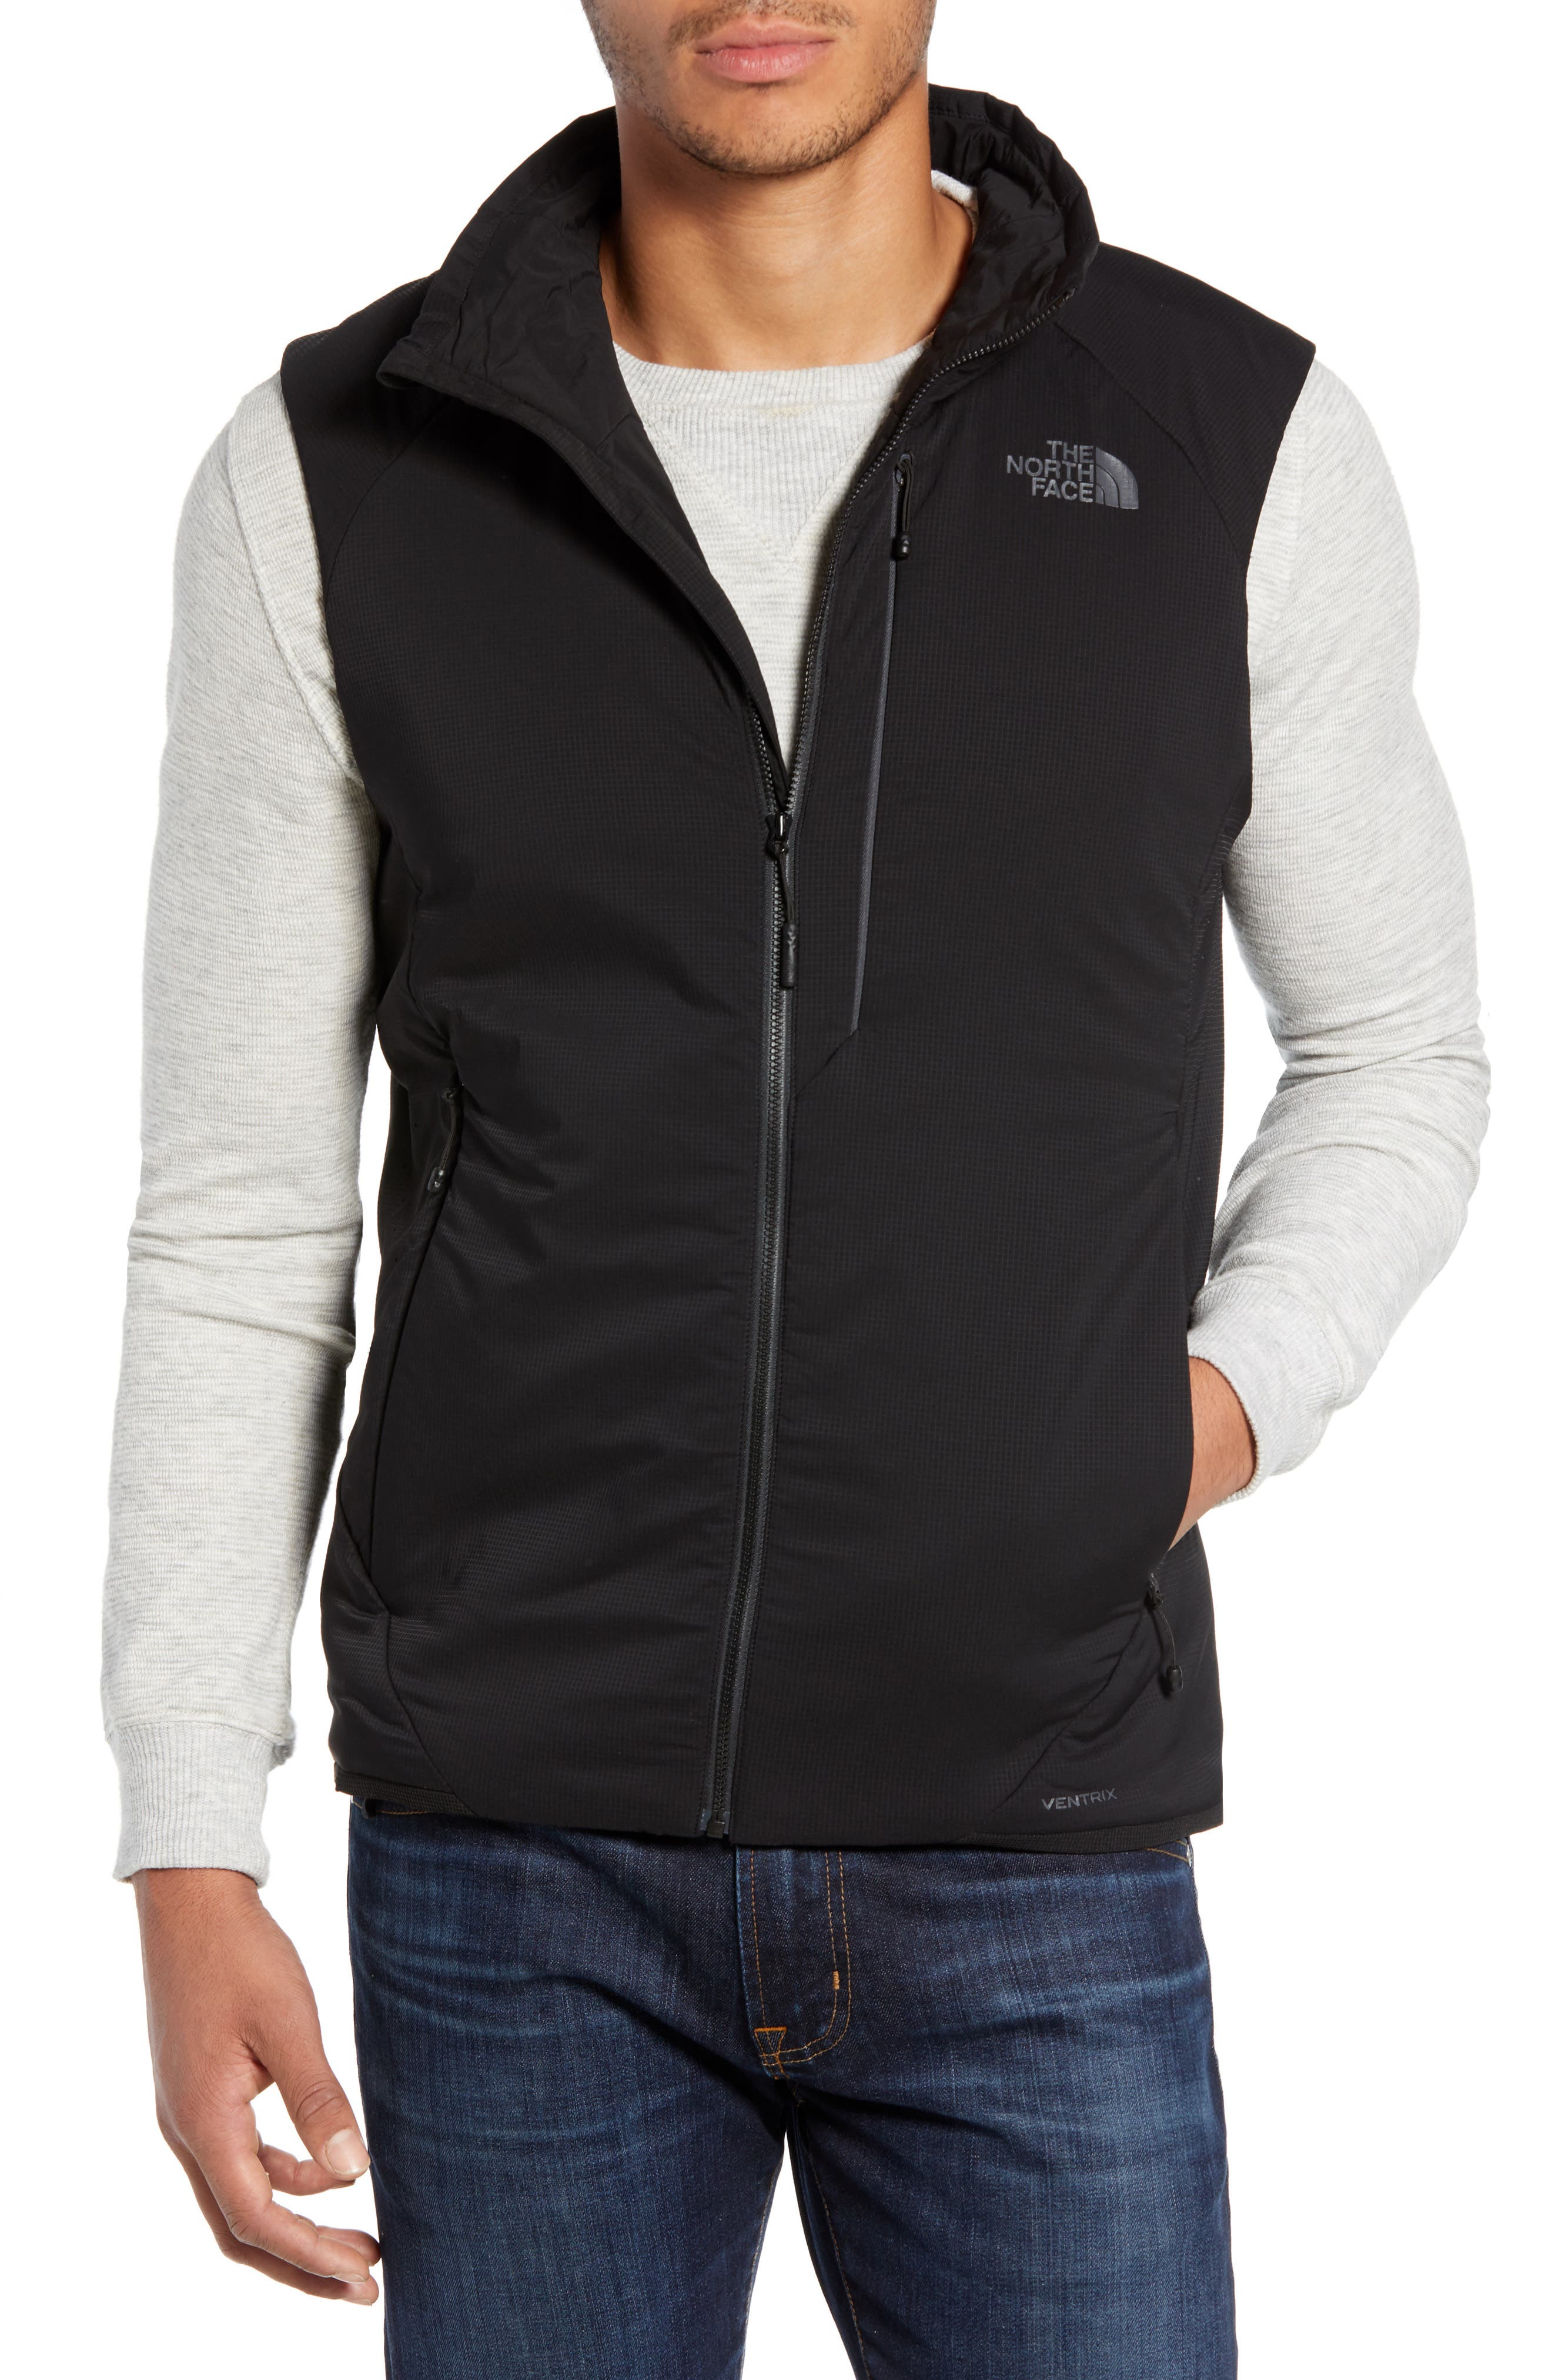 The North Face Ventrix(TM) Vest, Black